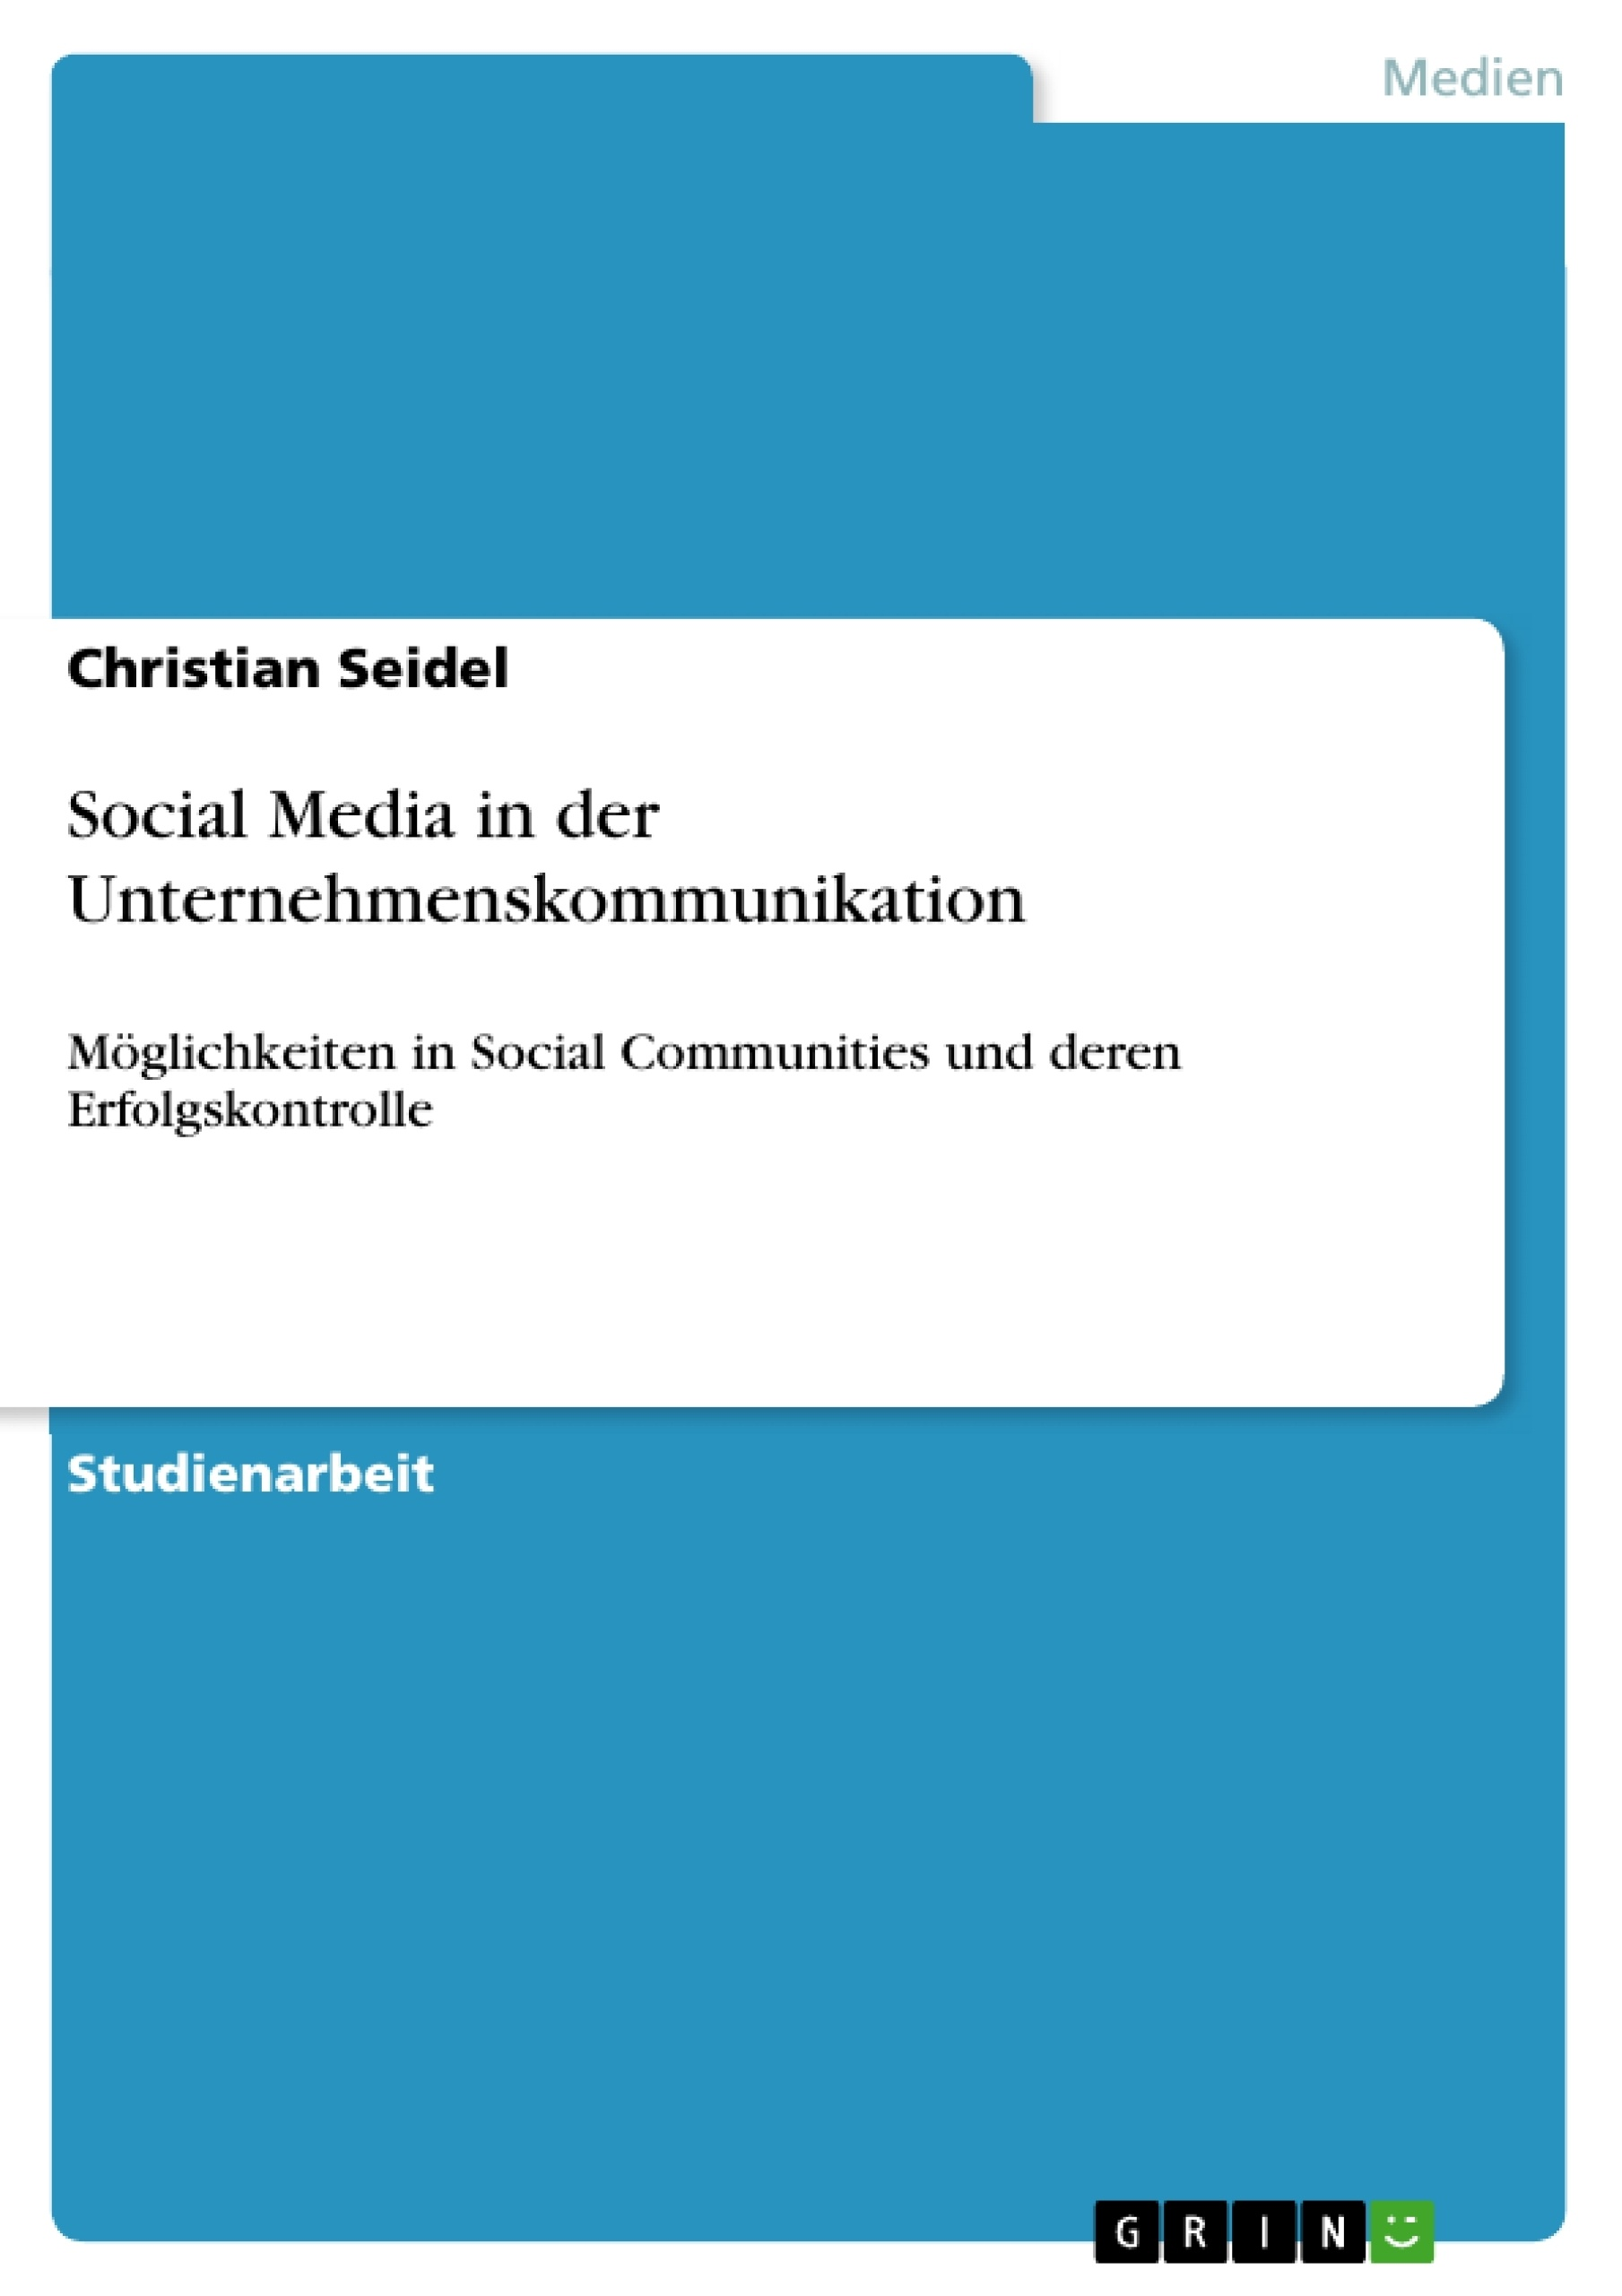 Titel: Social Media in der Unternehmenskommunikation